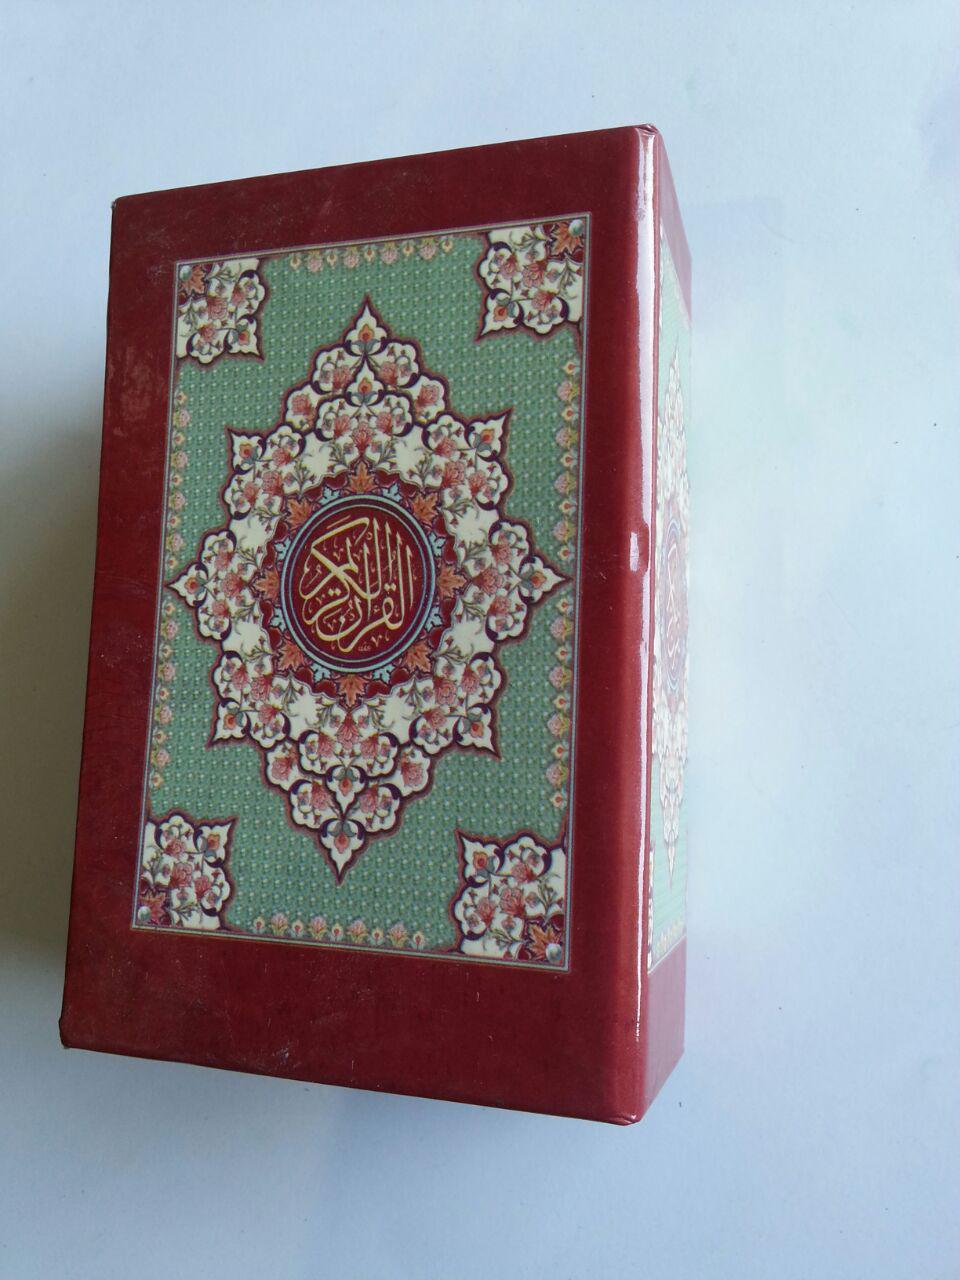 Al-Qur'an Impor Per Juz Tanpa Terjemah Ukuran 8x12 cover 3